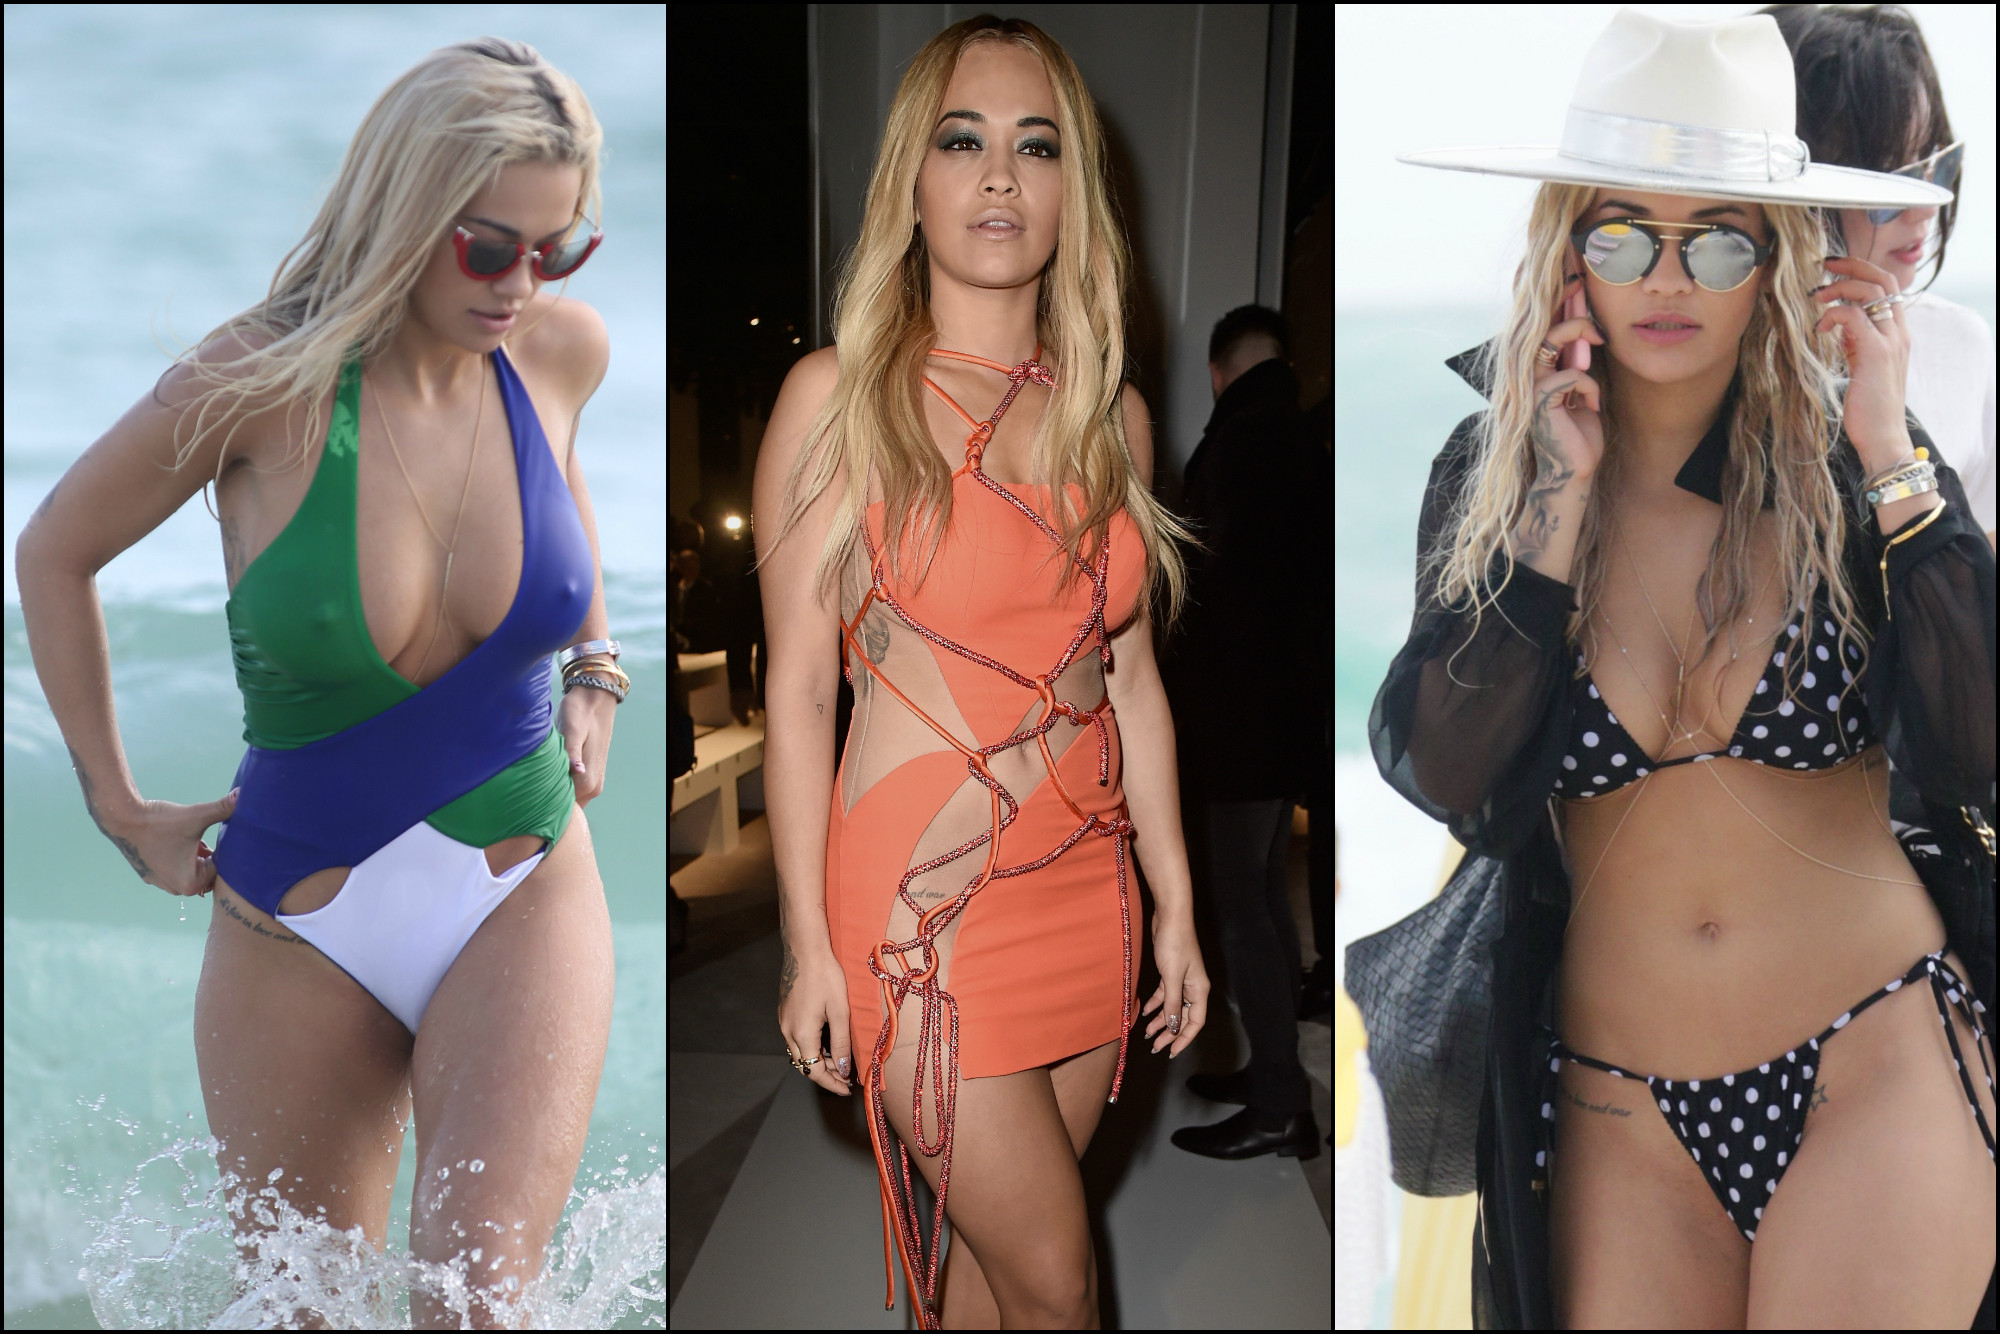 rita-ora-bikini-rita-ora-swimsuit-rita-ora-versace-rita-ora-becky-with-the-good-hair (1)